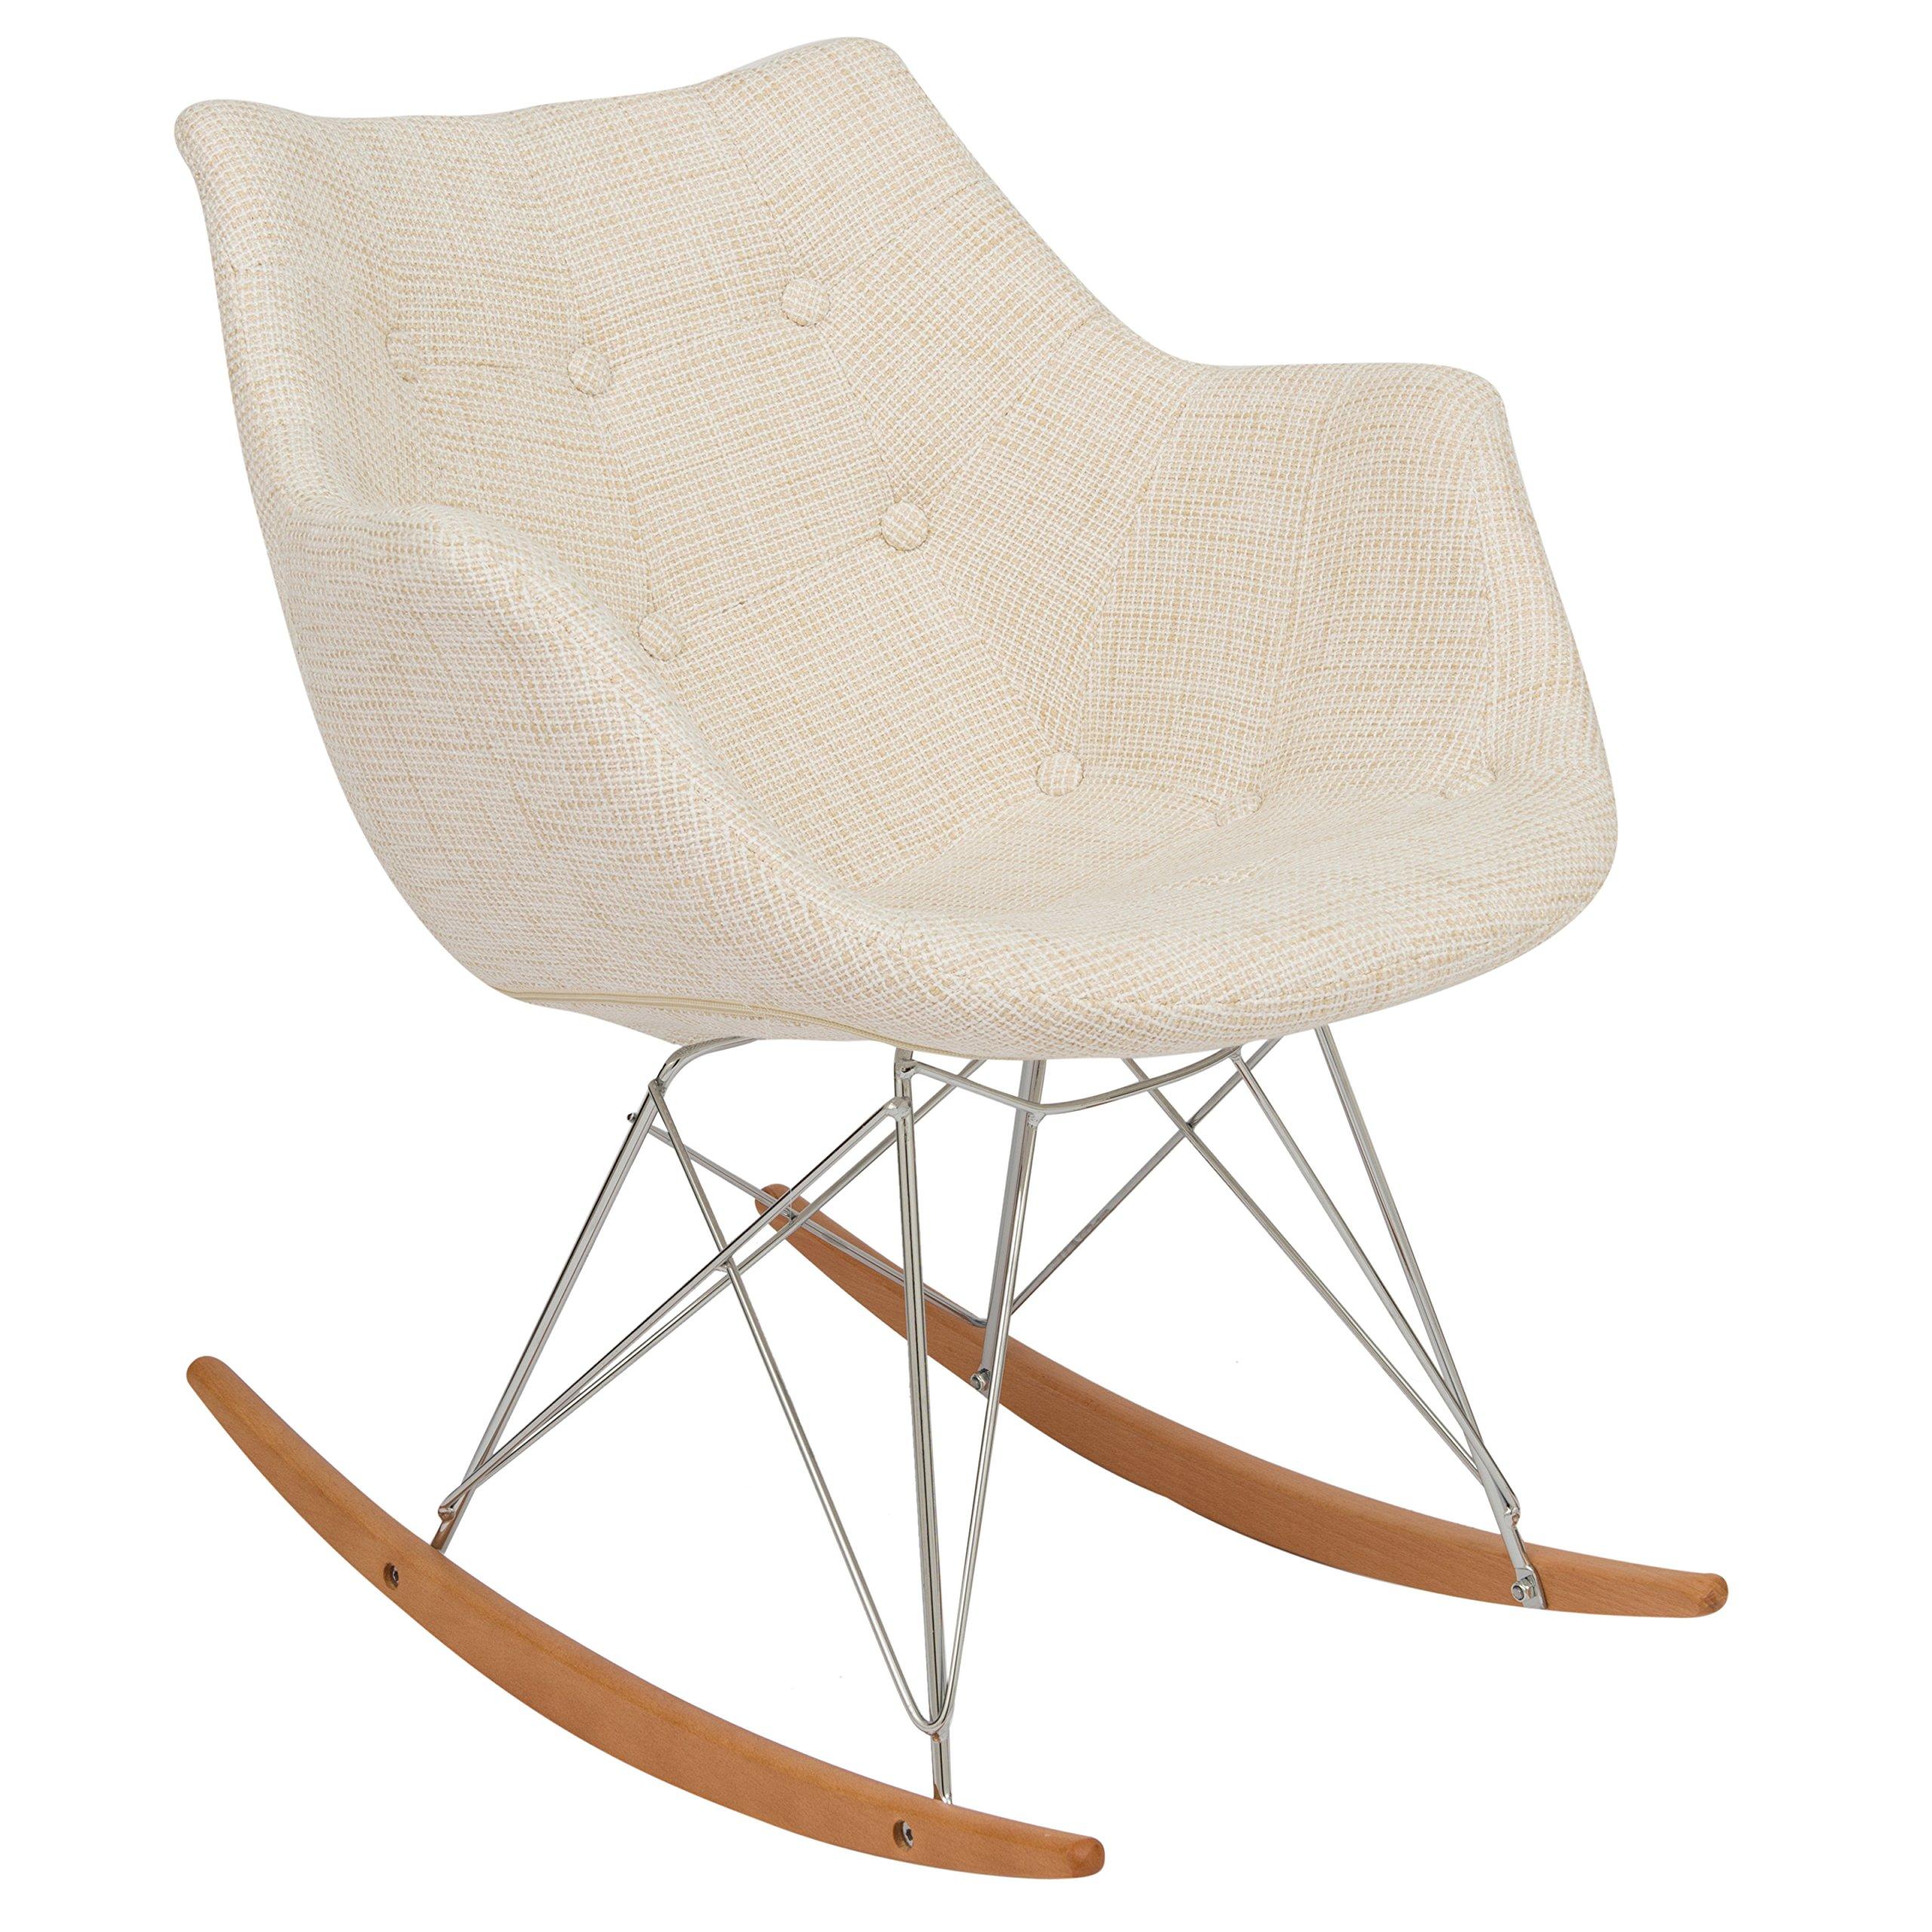 LeisureMod Willow Fabric Eiffel Base Modern Petite Rocking Chair in Beige